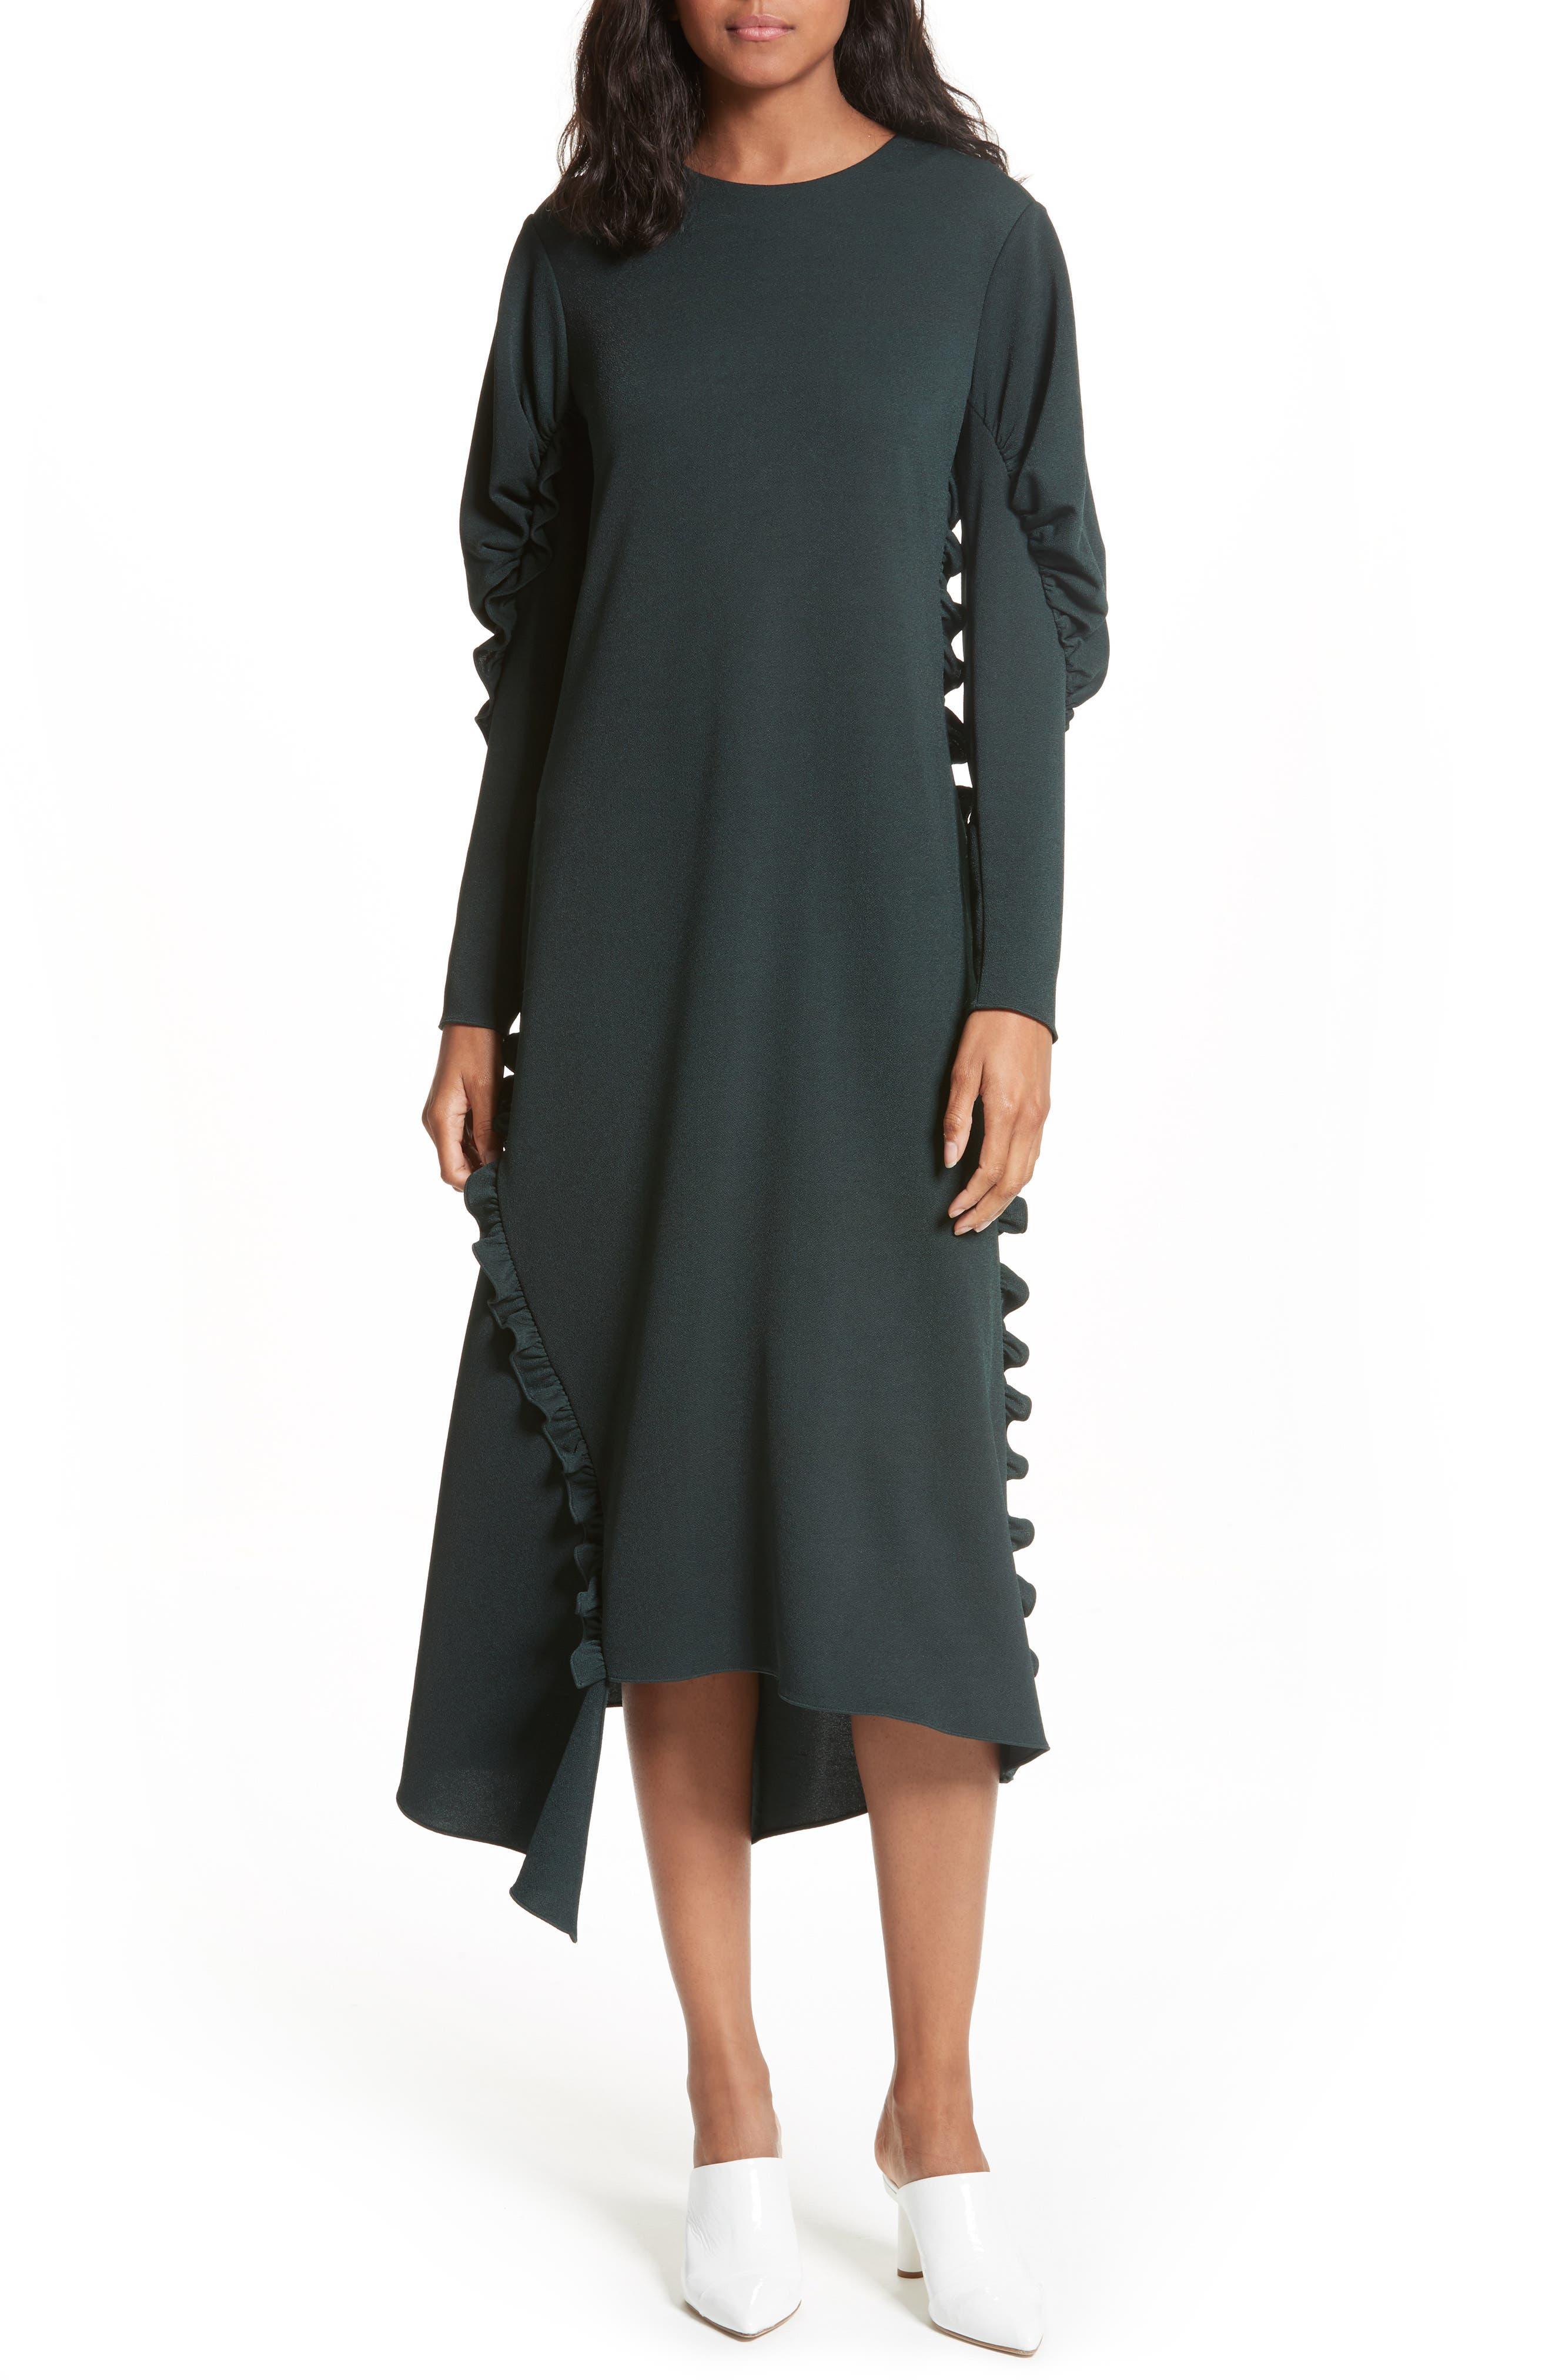 Tibi Ruffled Crepe Knit Midi Dress